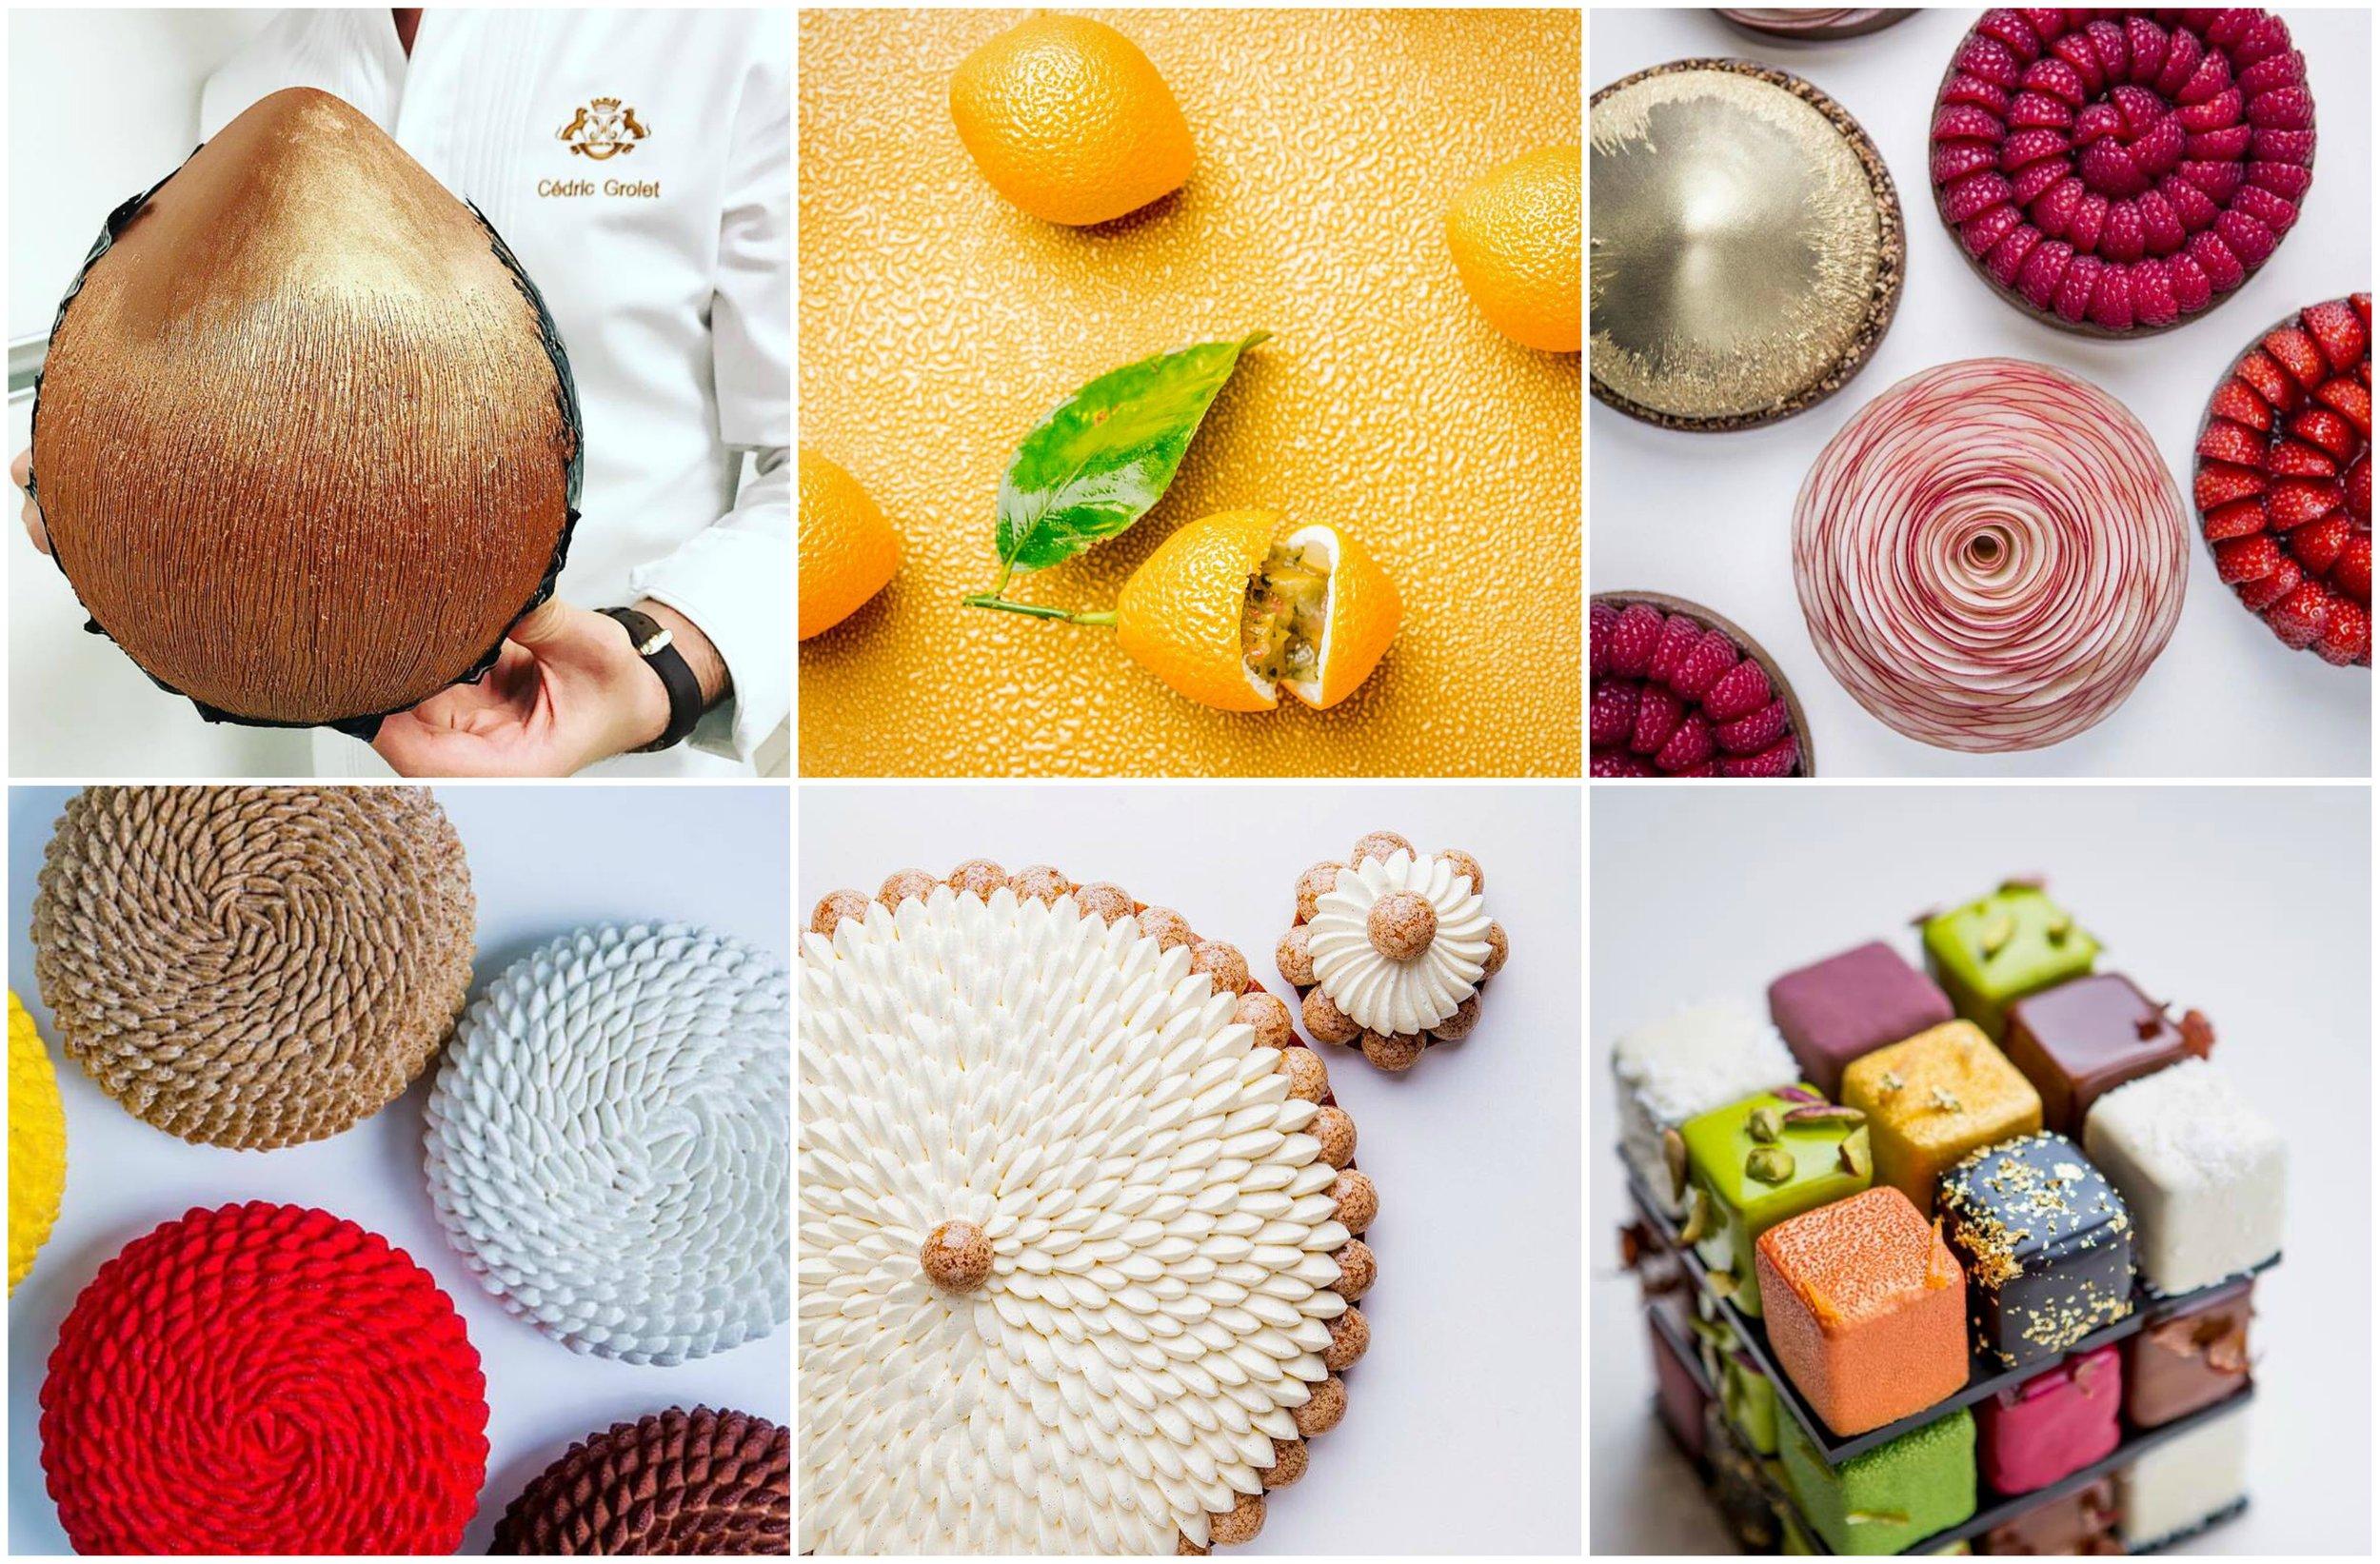 Cédric Grolet 的招牌作品。由左至右、先上排後下排分別為榛果、檸檬水果雕塑、水果塔、大型蛋糕、聖多諾黑與魔術方塊。 Photo|Cédric Grolet, Facebook